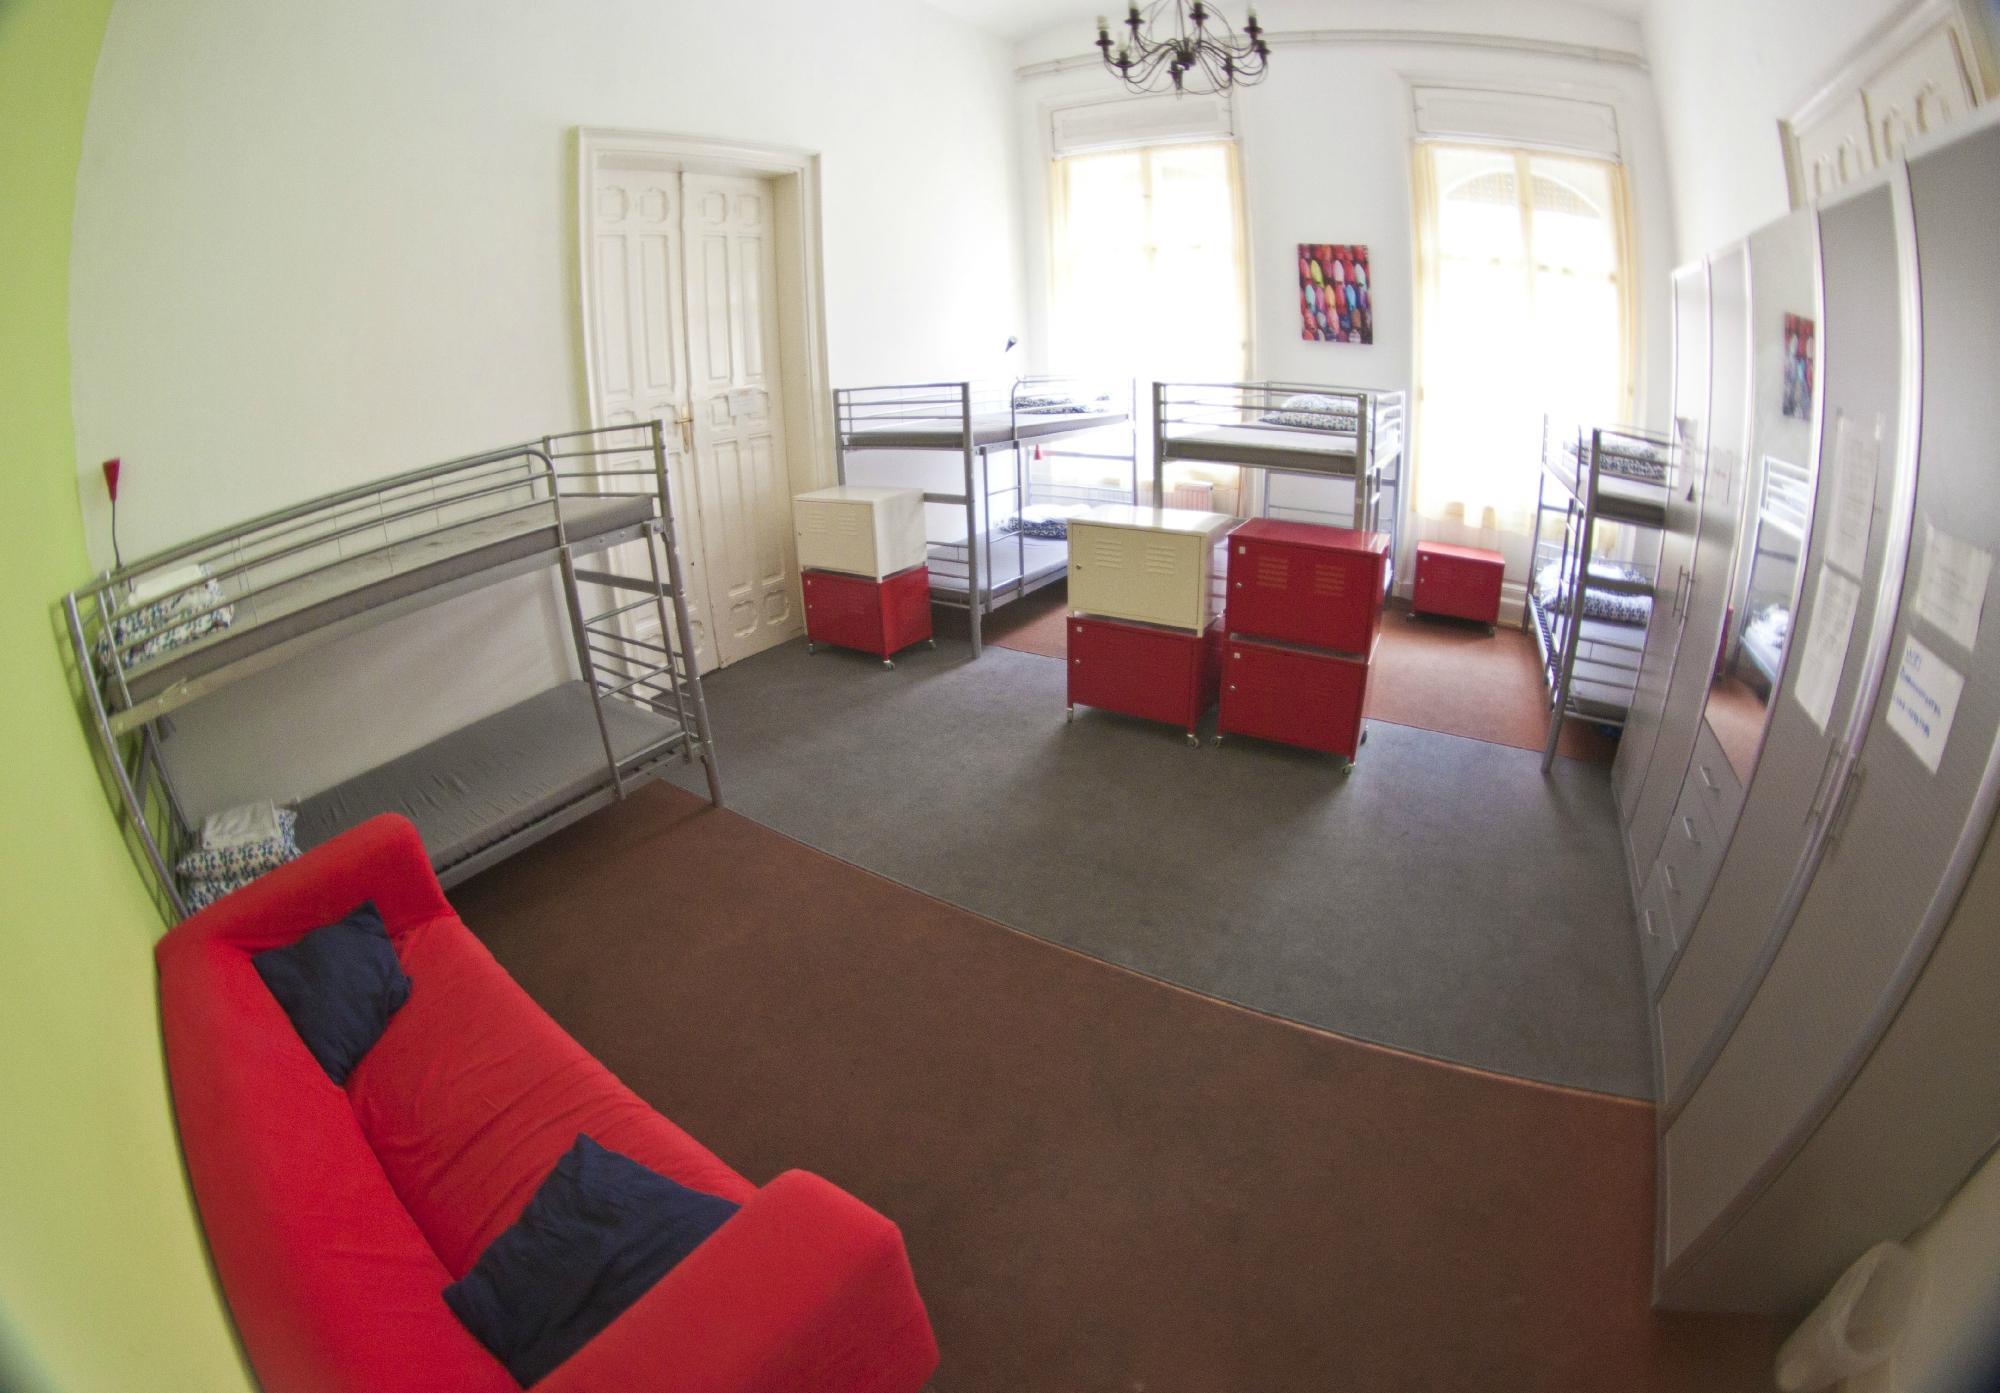 Barocco Hostel